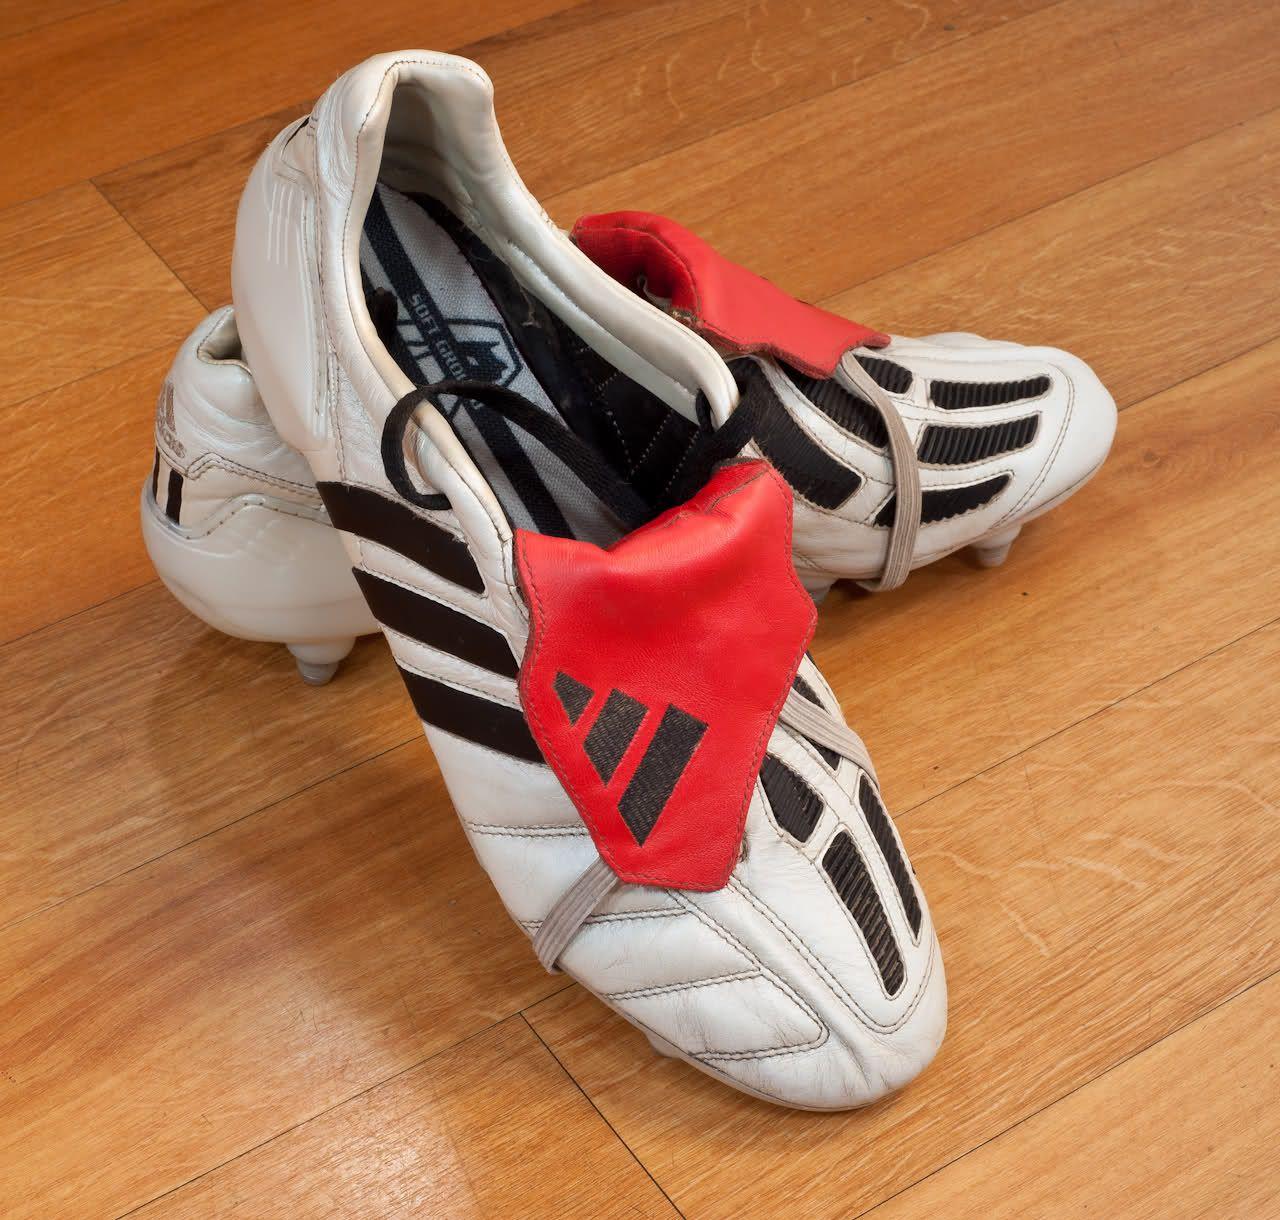 5c30580cd6c2 adidas predator old style - saspl.in